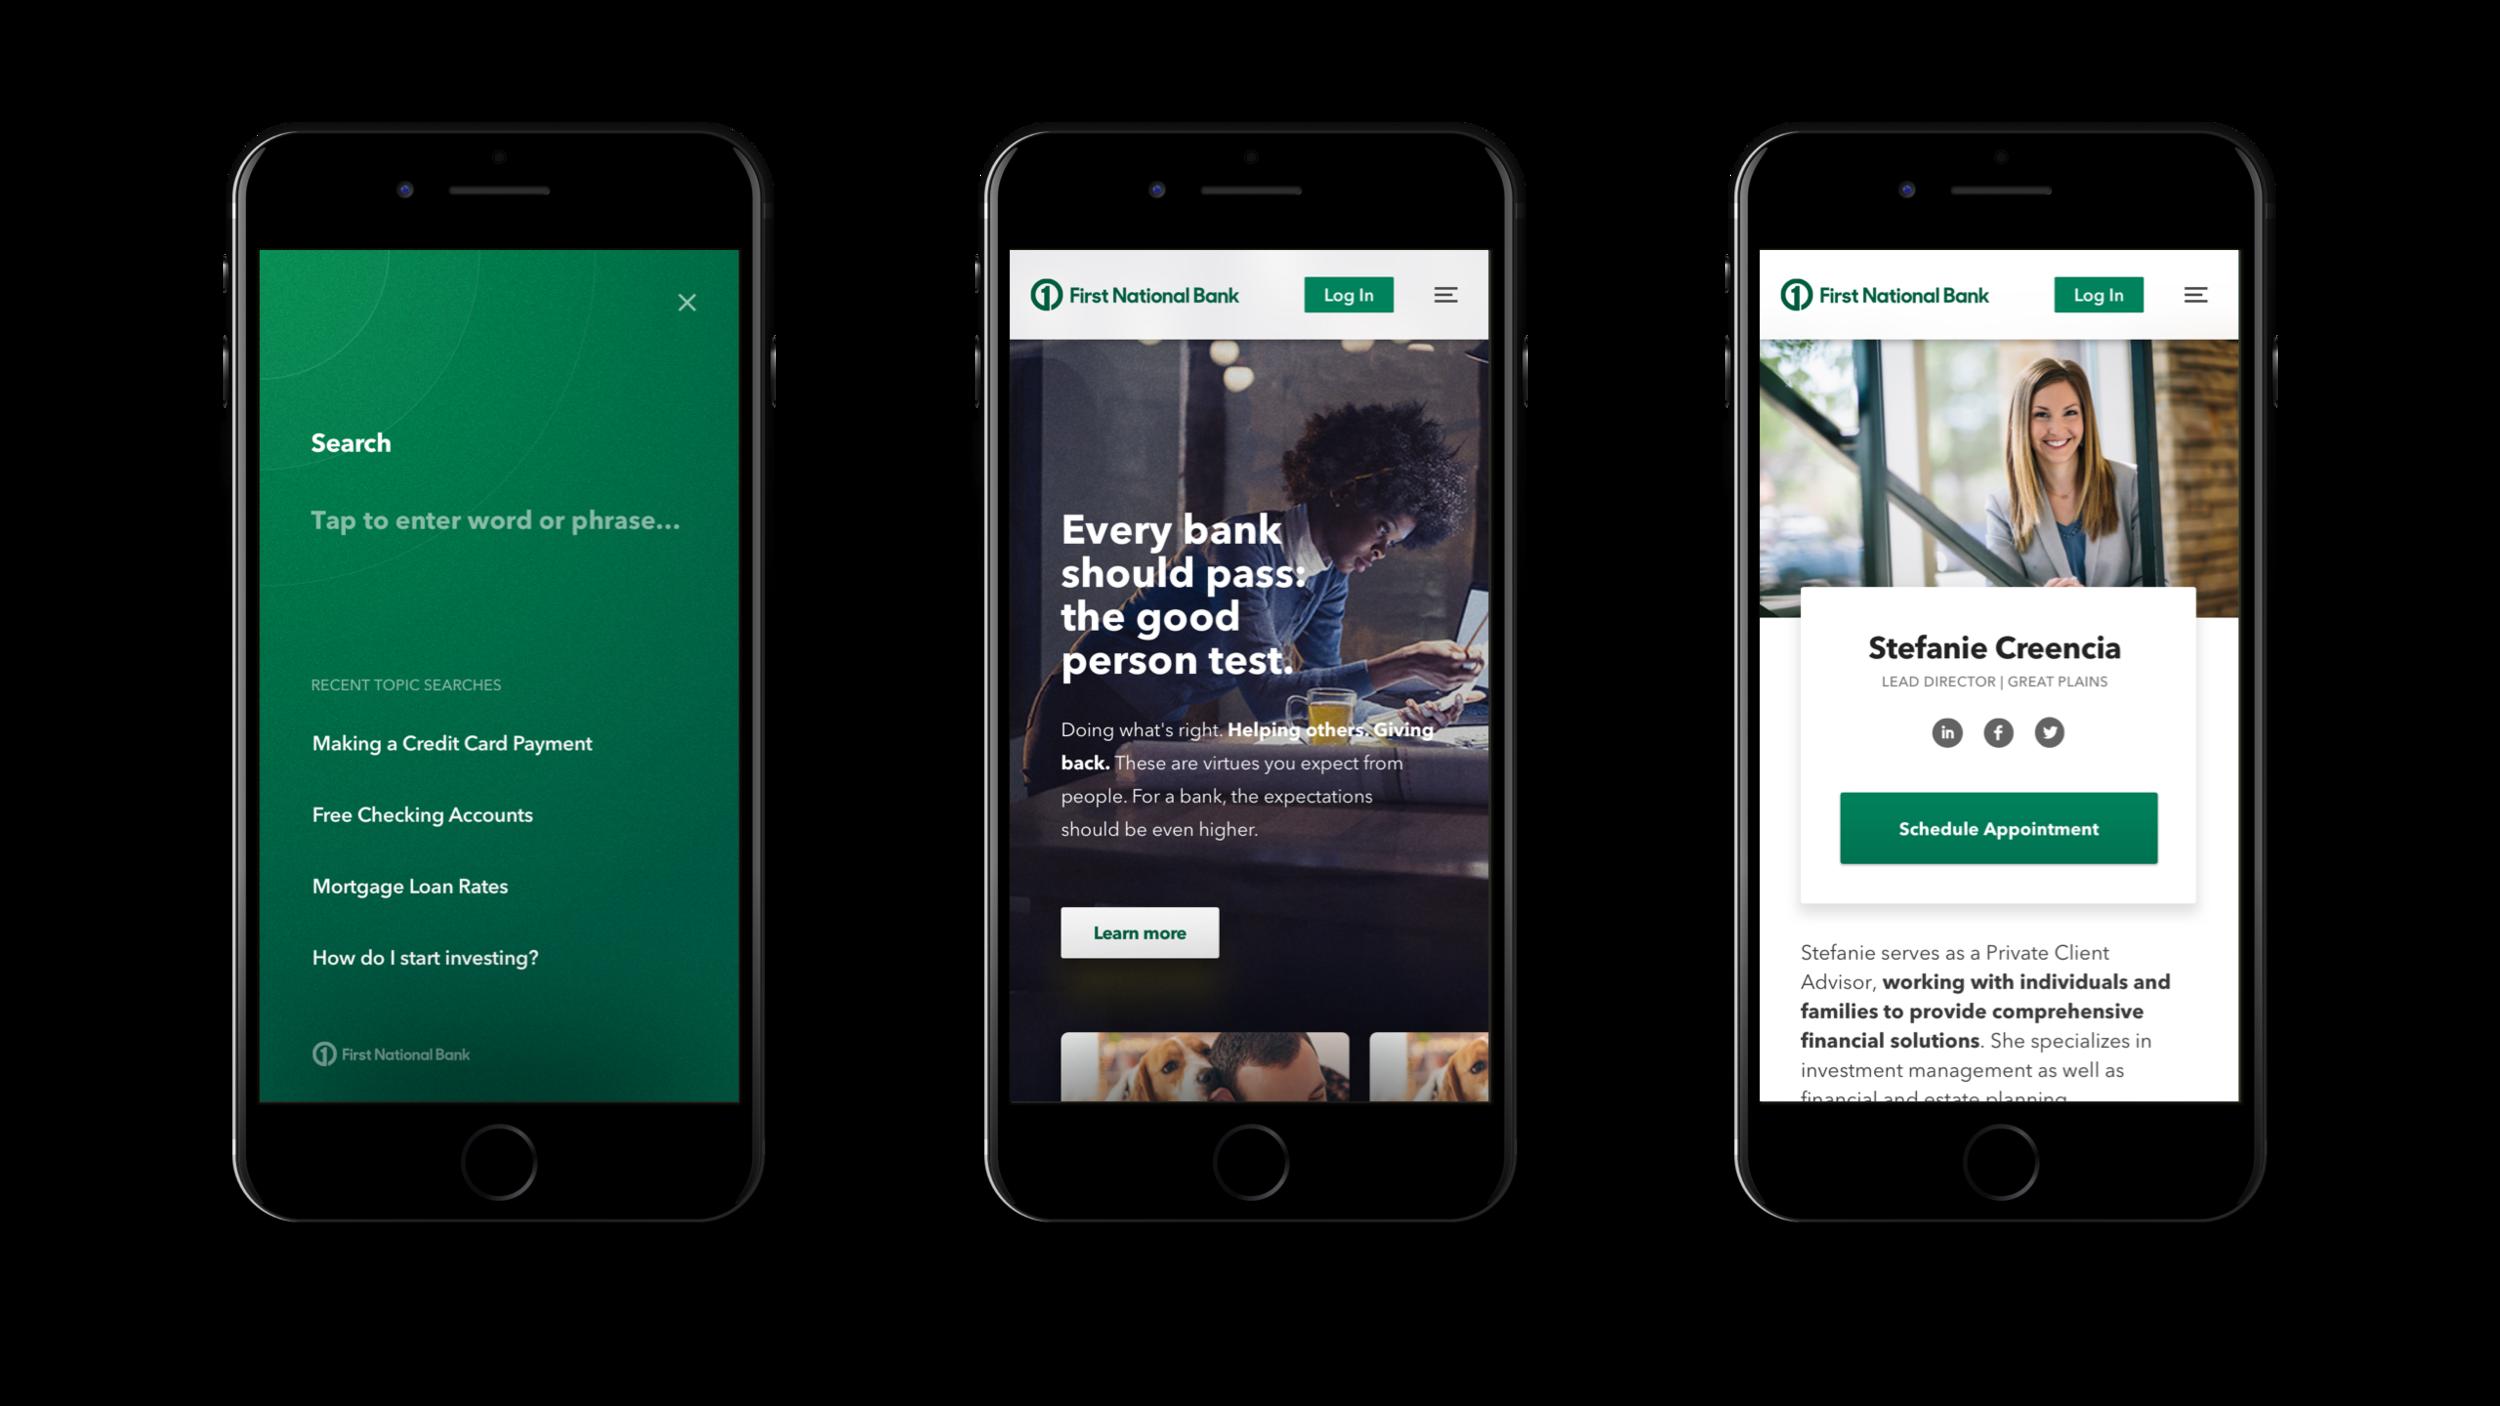 fnbo-website-mobile-screens-multiple